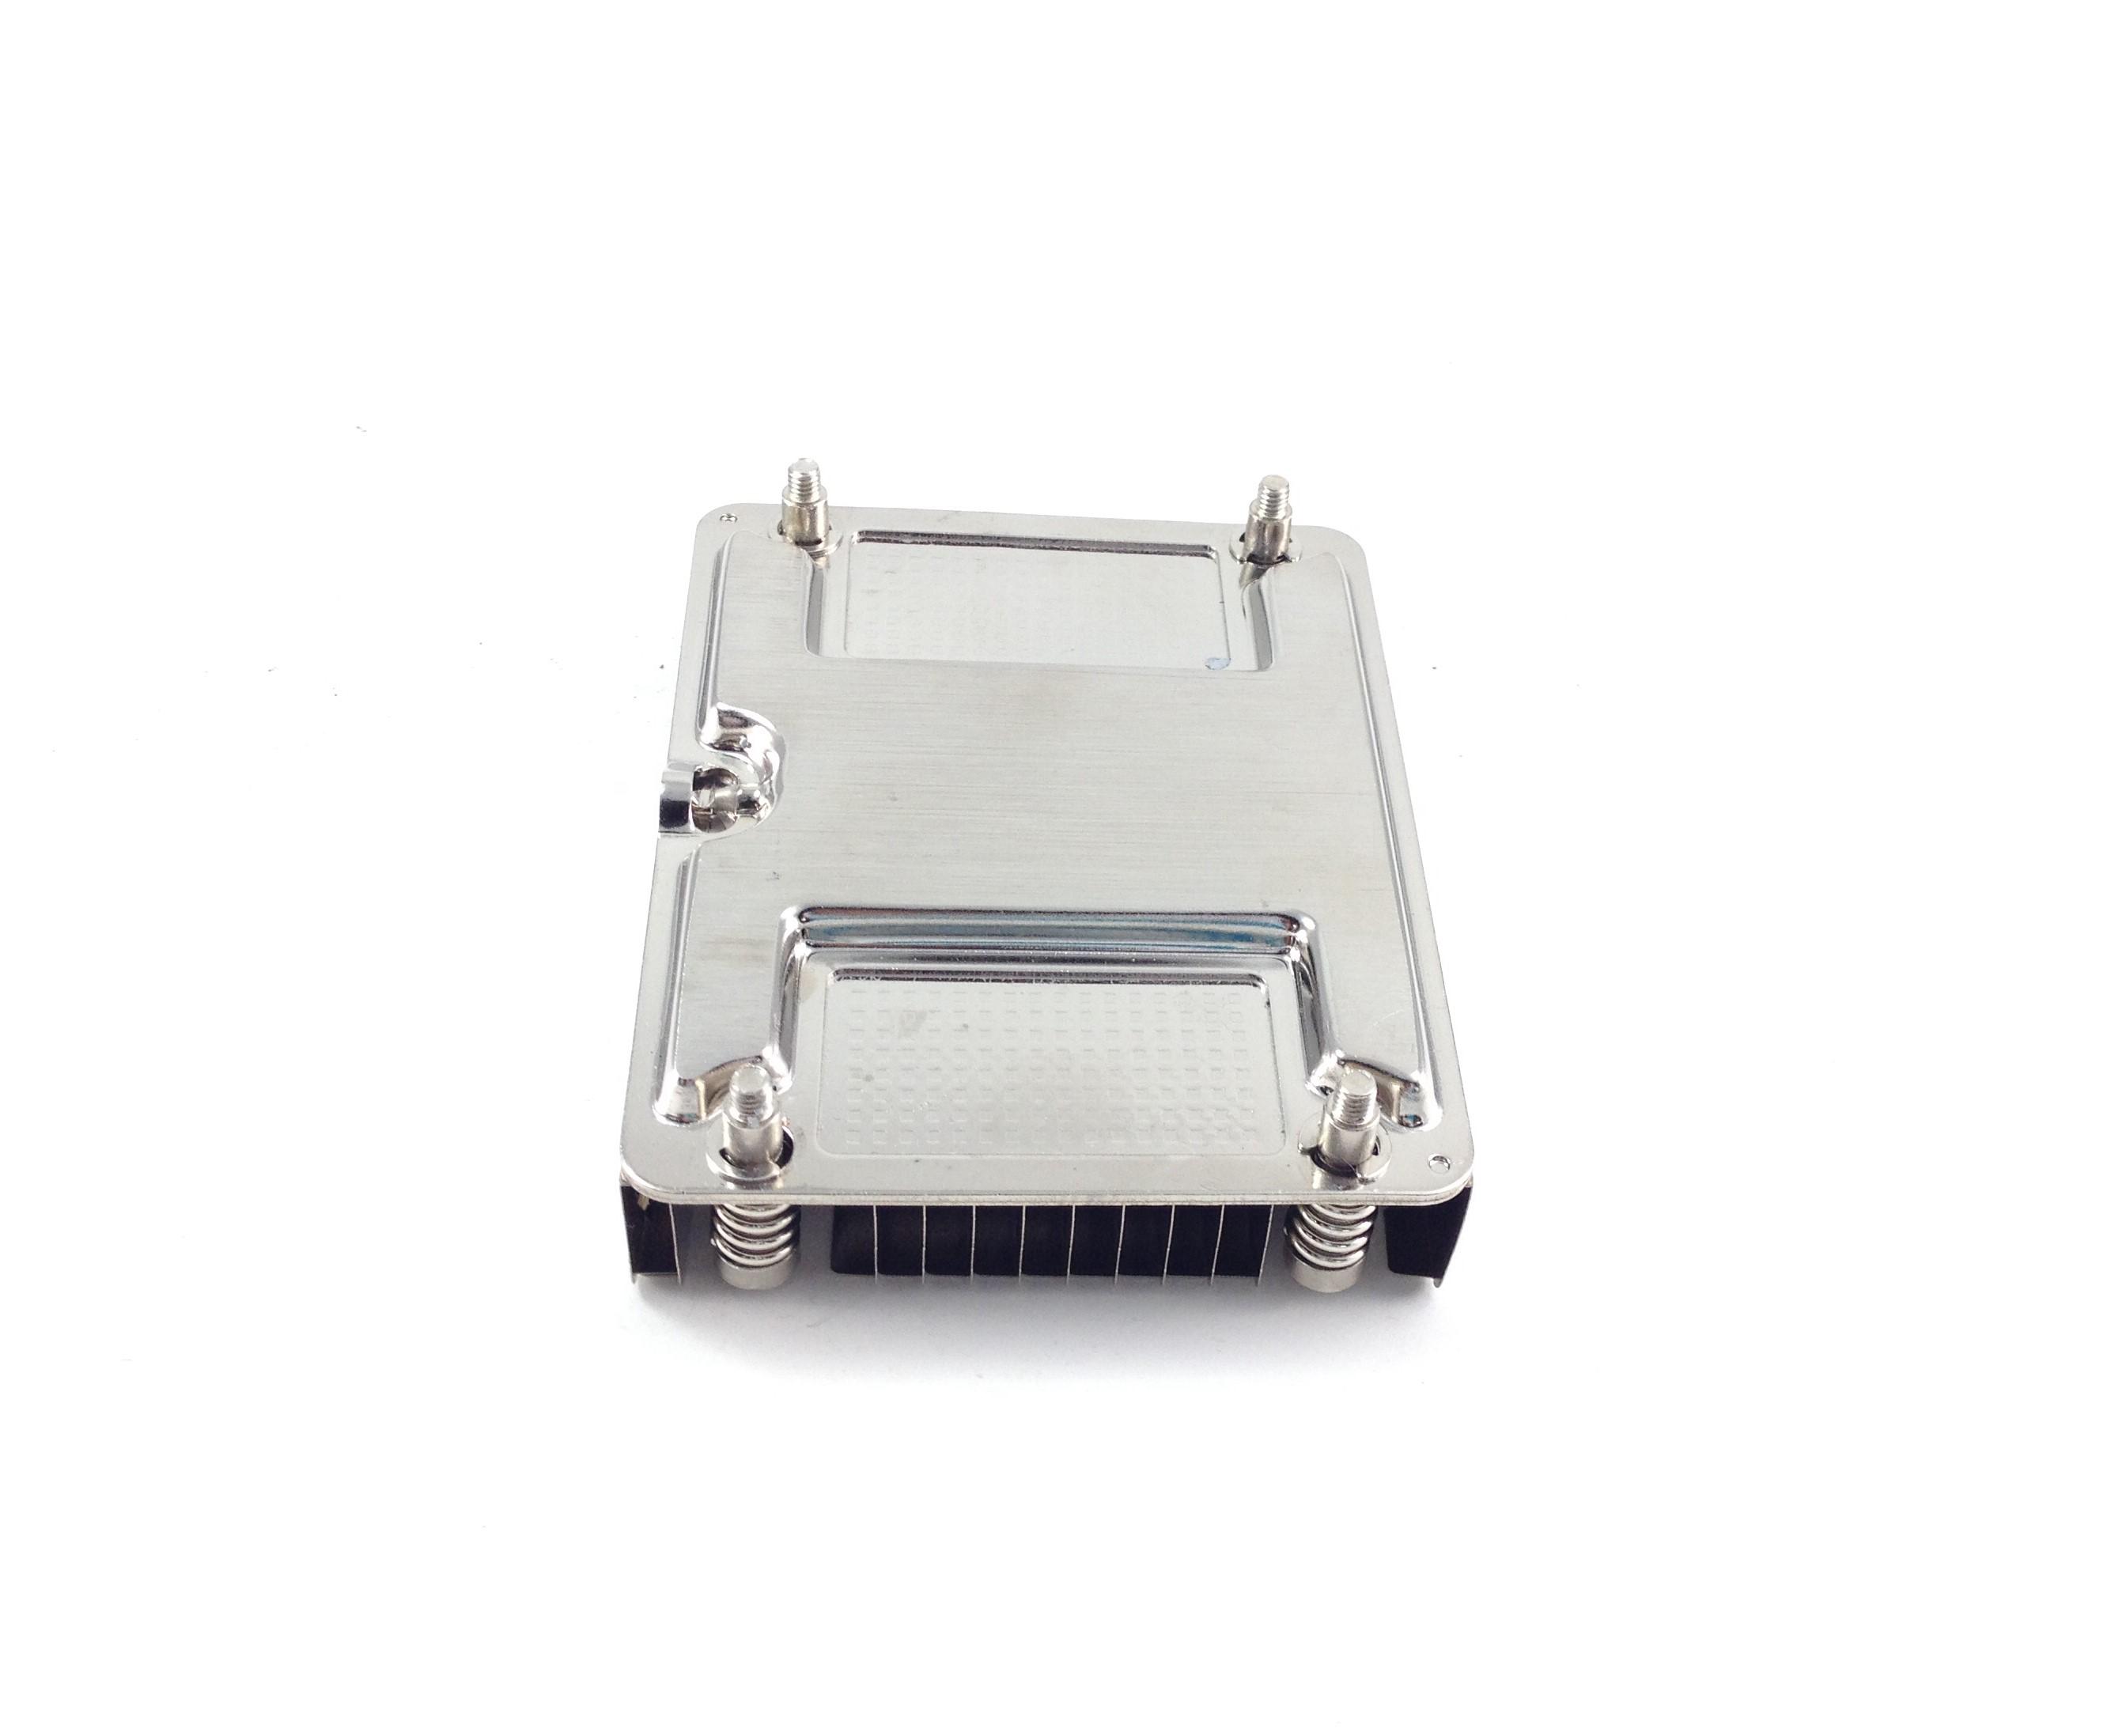 HP Sl200 Series Proccessor Heatsink (709990-001)